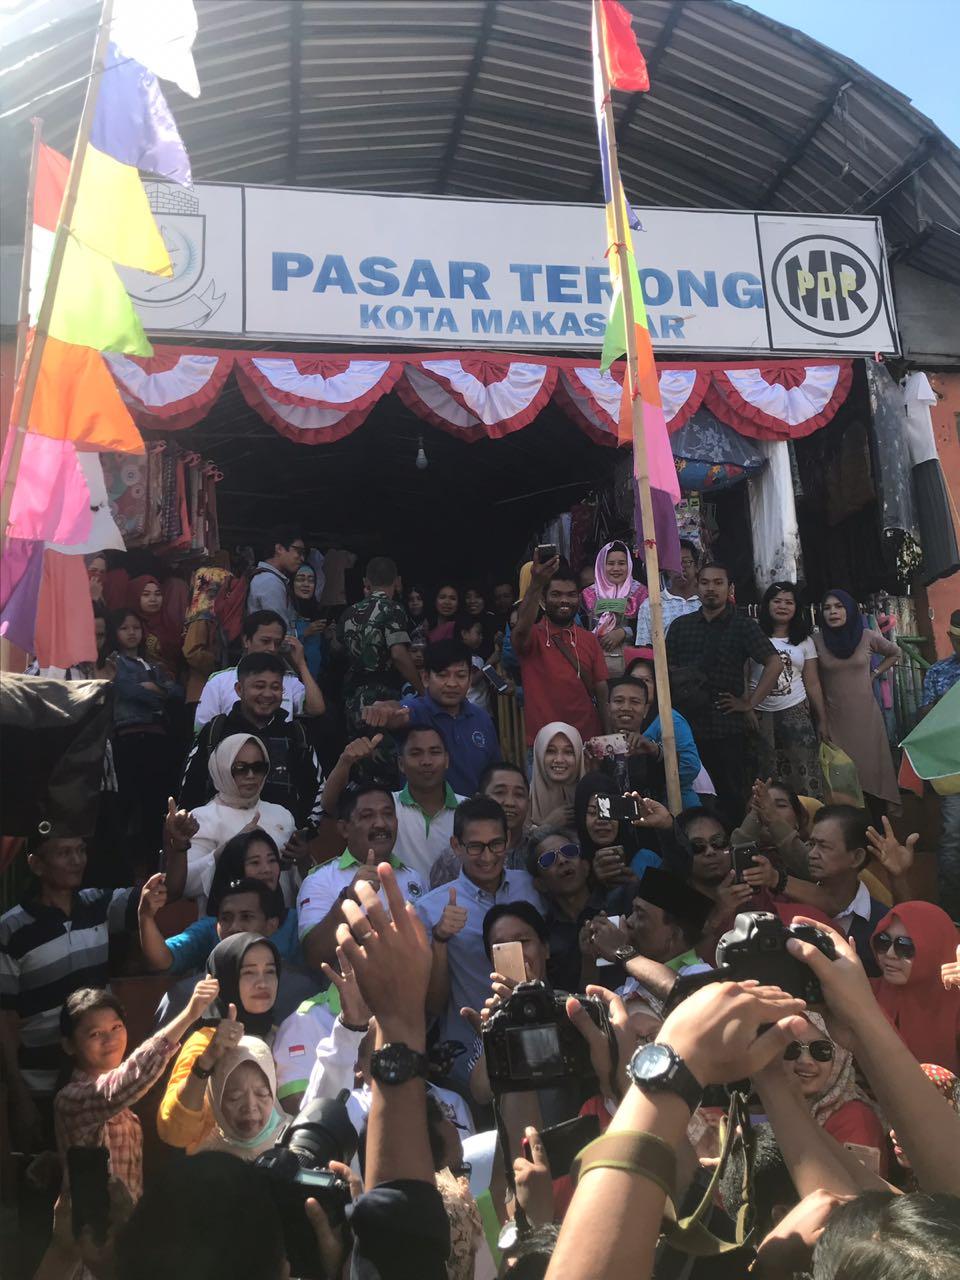 Sandi Kunjungi Makassar, Netizen Sampaikan Sindiran Telak